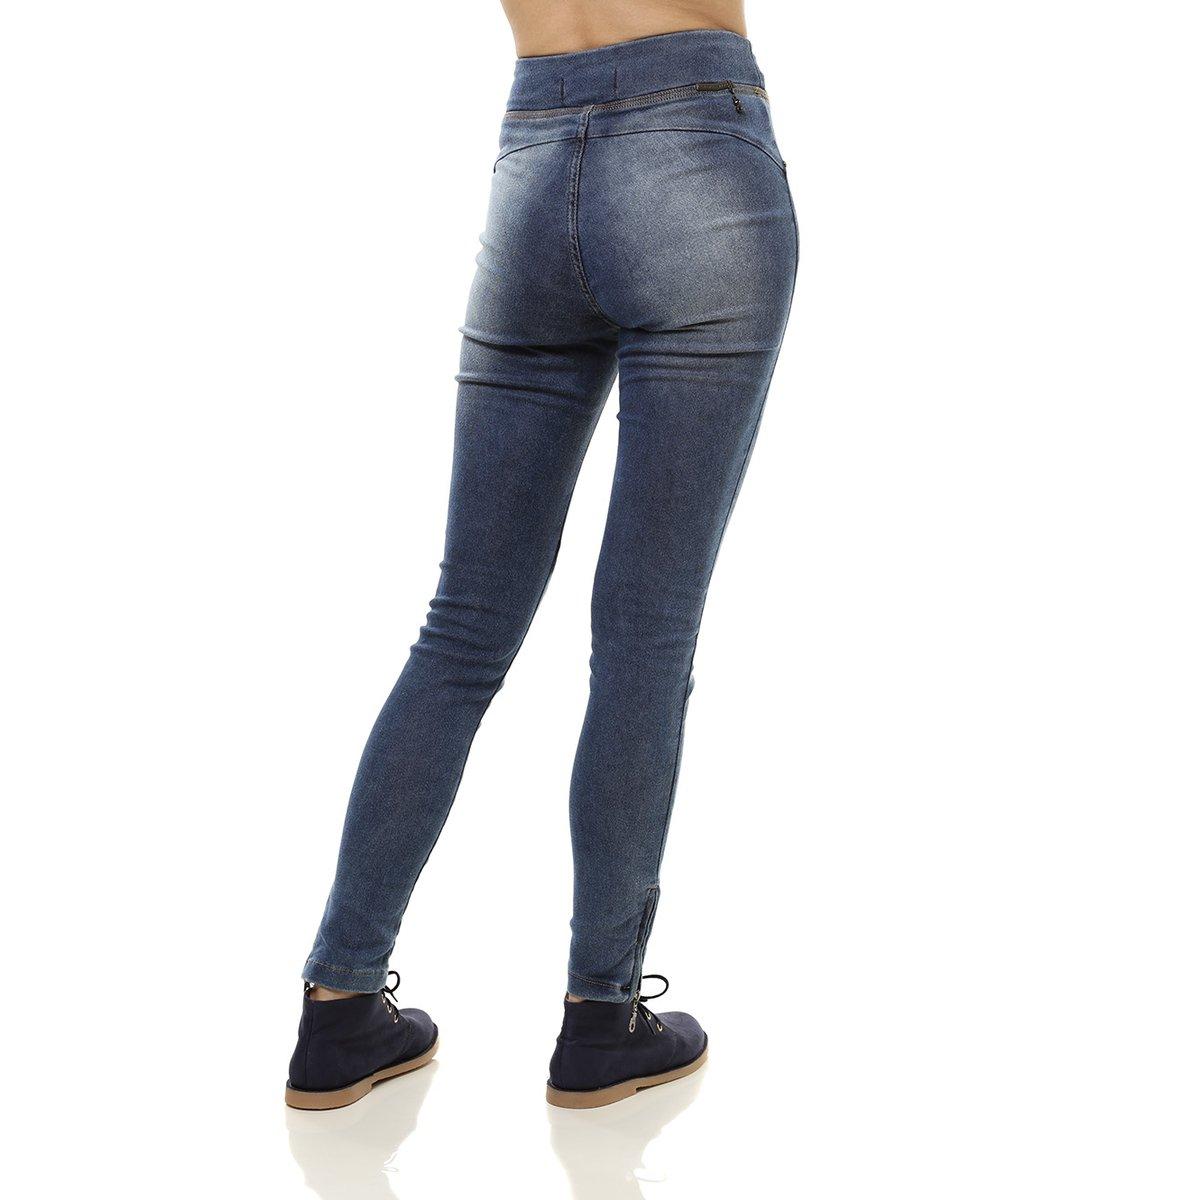 Calça Jeans Feminina Jegging Azul  Calça Jeans Feminina Jegging Azul ... a32755fd779cb